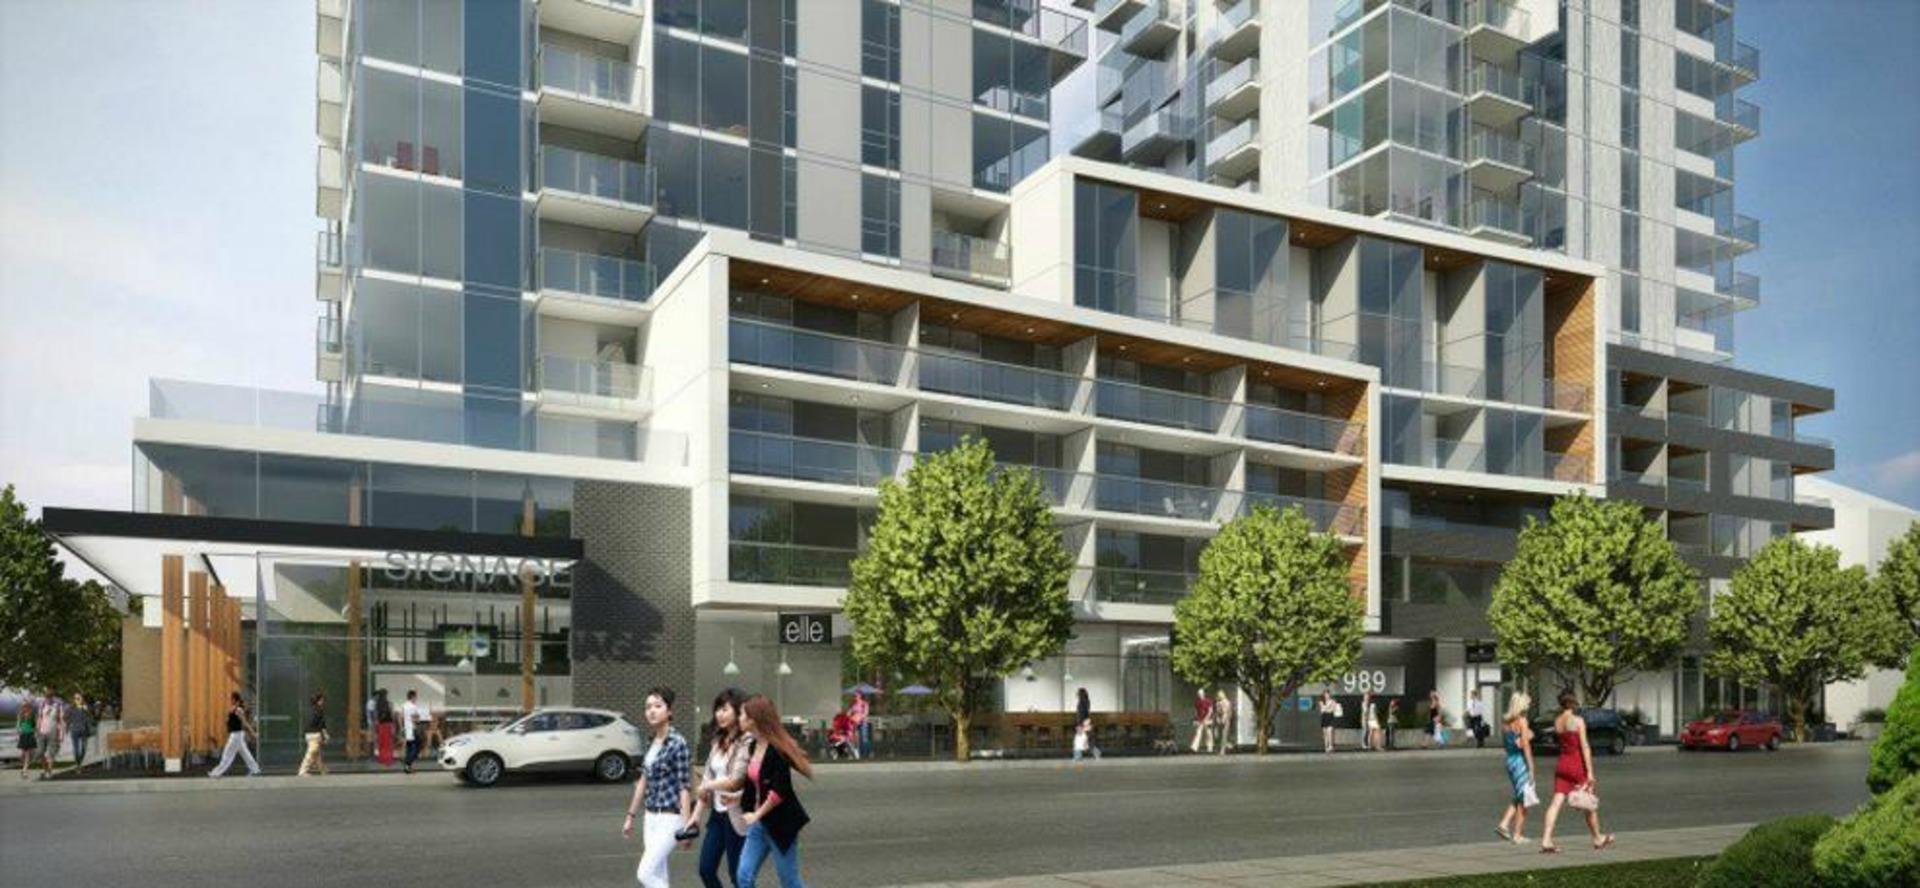 989-johnson-street-victoria at 989 Victoria (989 Johnson Street, Downtown and Harris Green, Victoria)